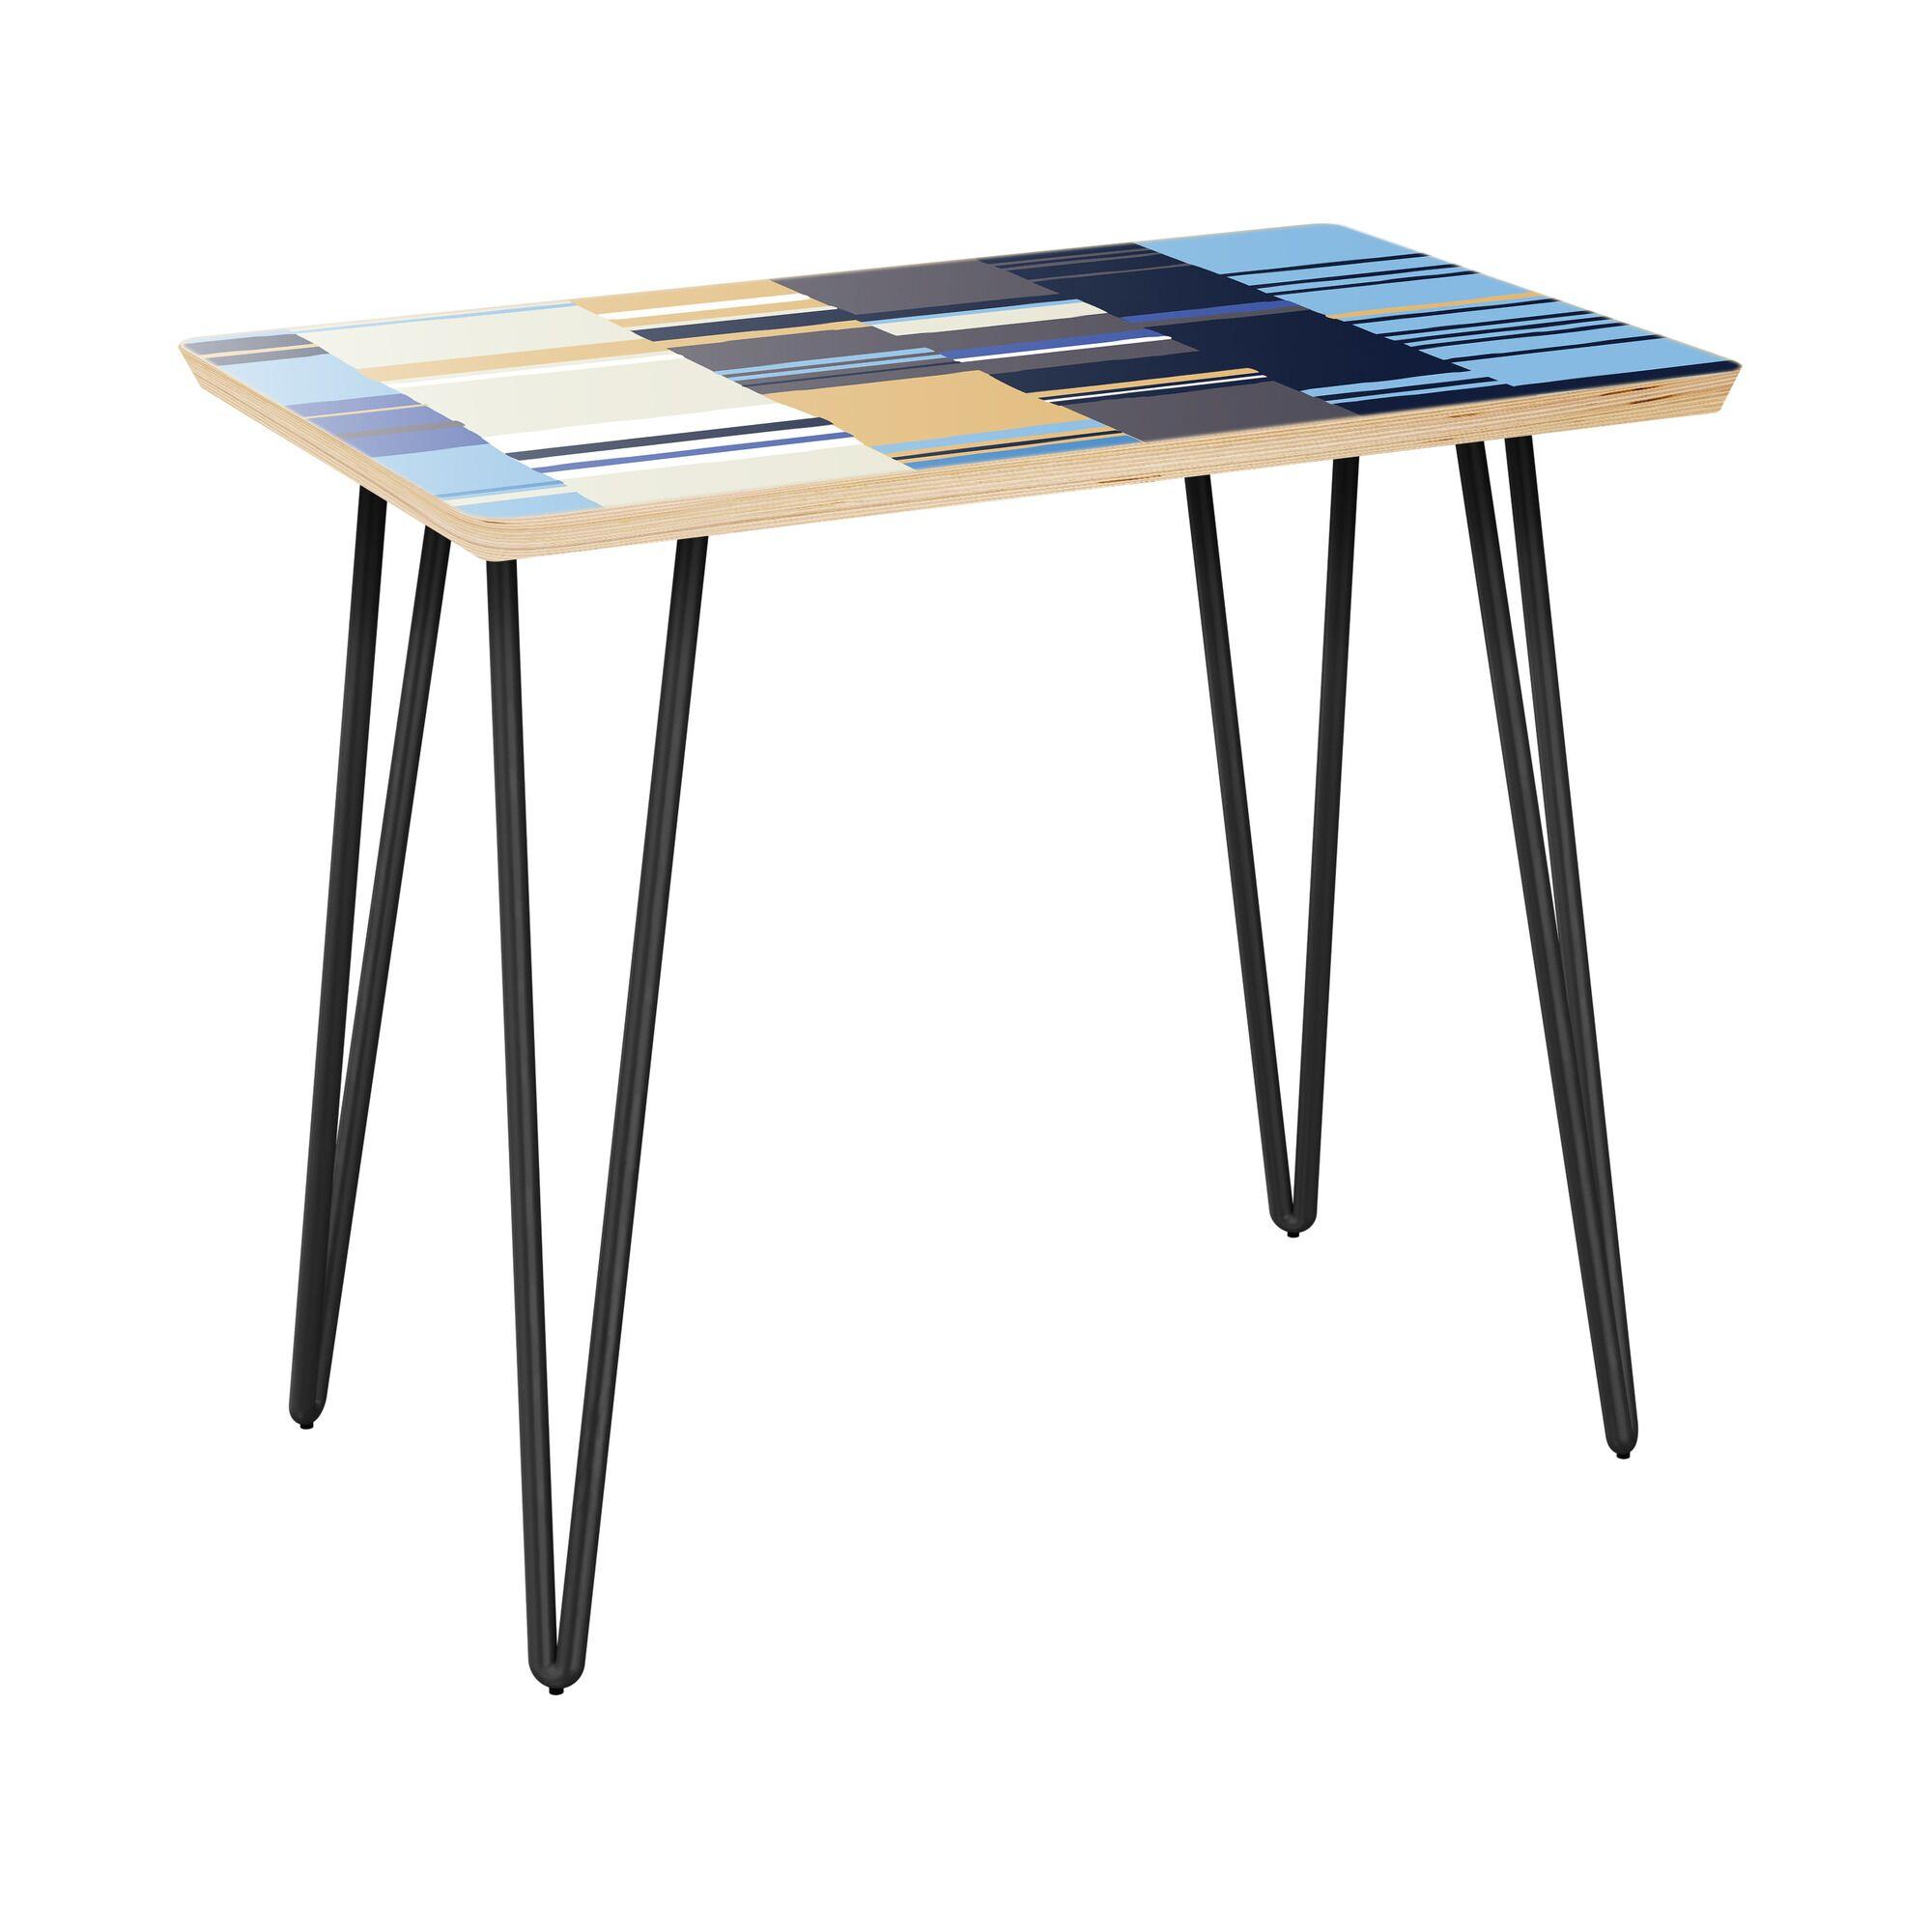 Kilraghts End Table Table Top Color: Natural, Table Base Color: Black